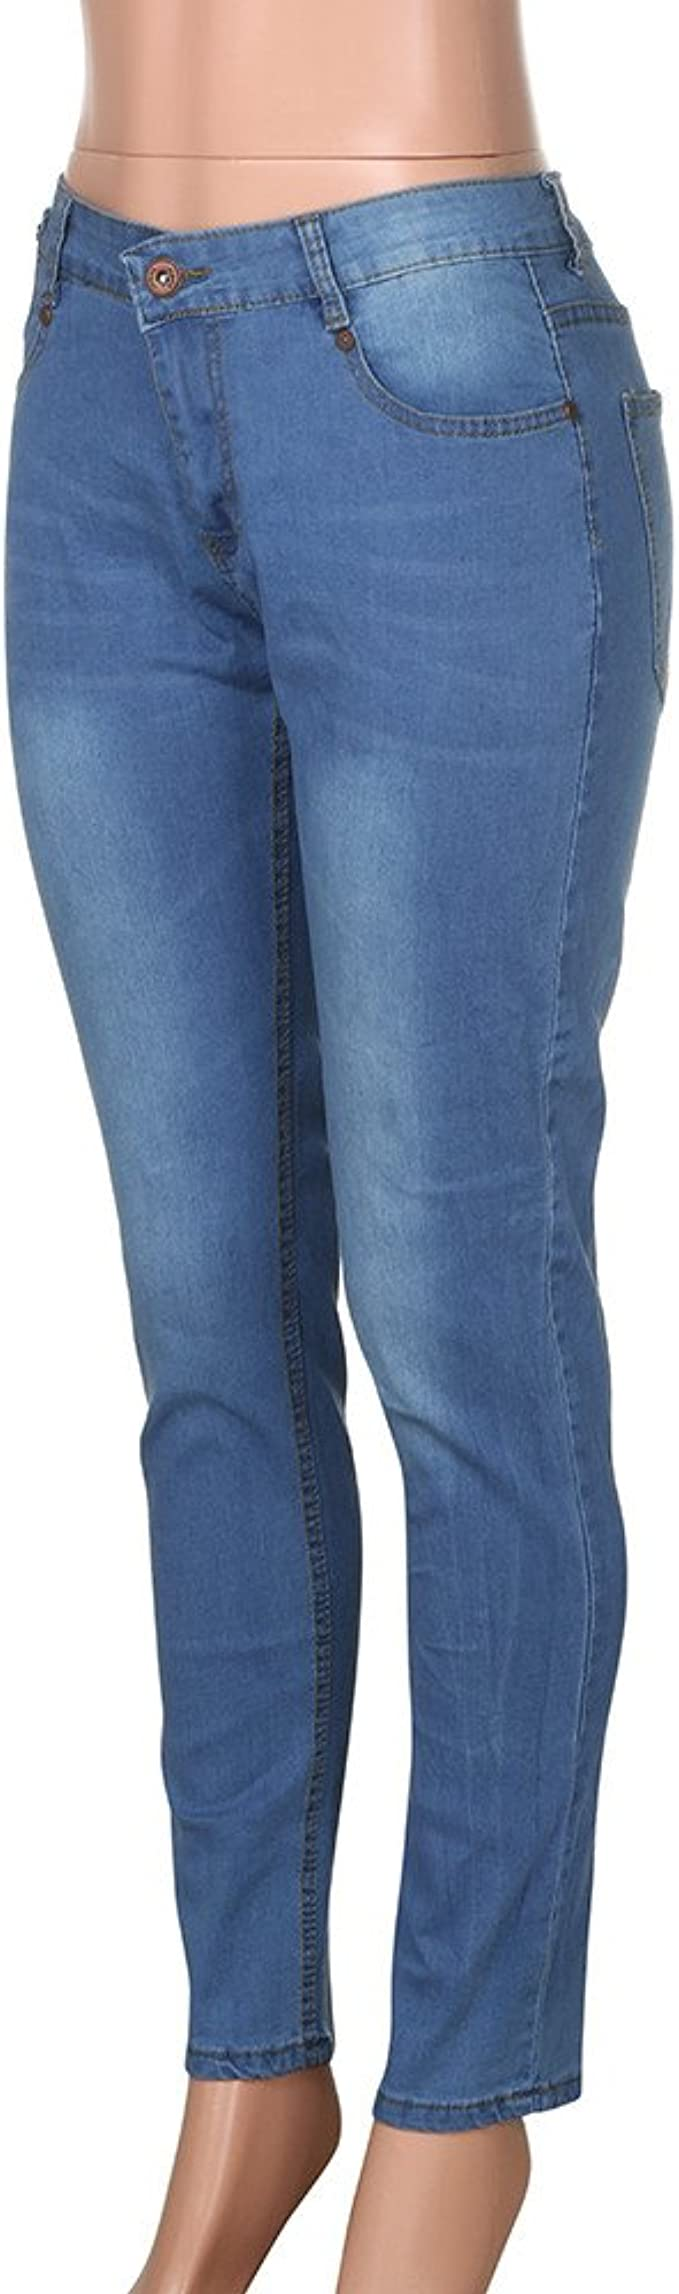 VPASS Pantalones Vaqueros para Hombre, Pantalones Casuales Solid ...